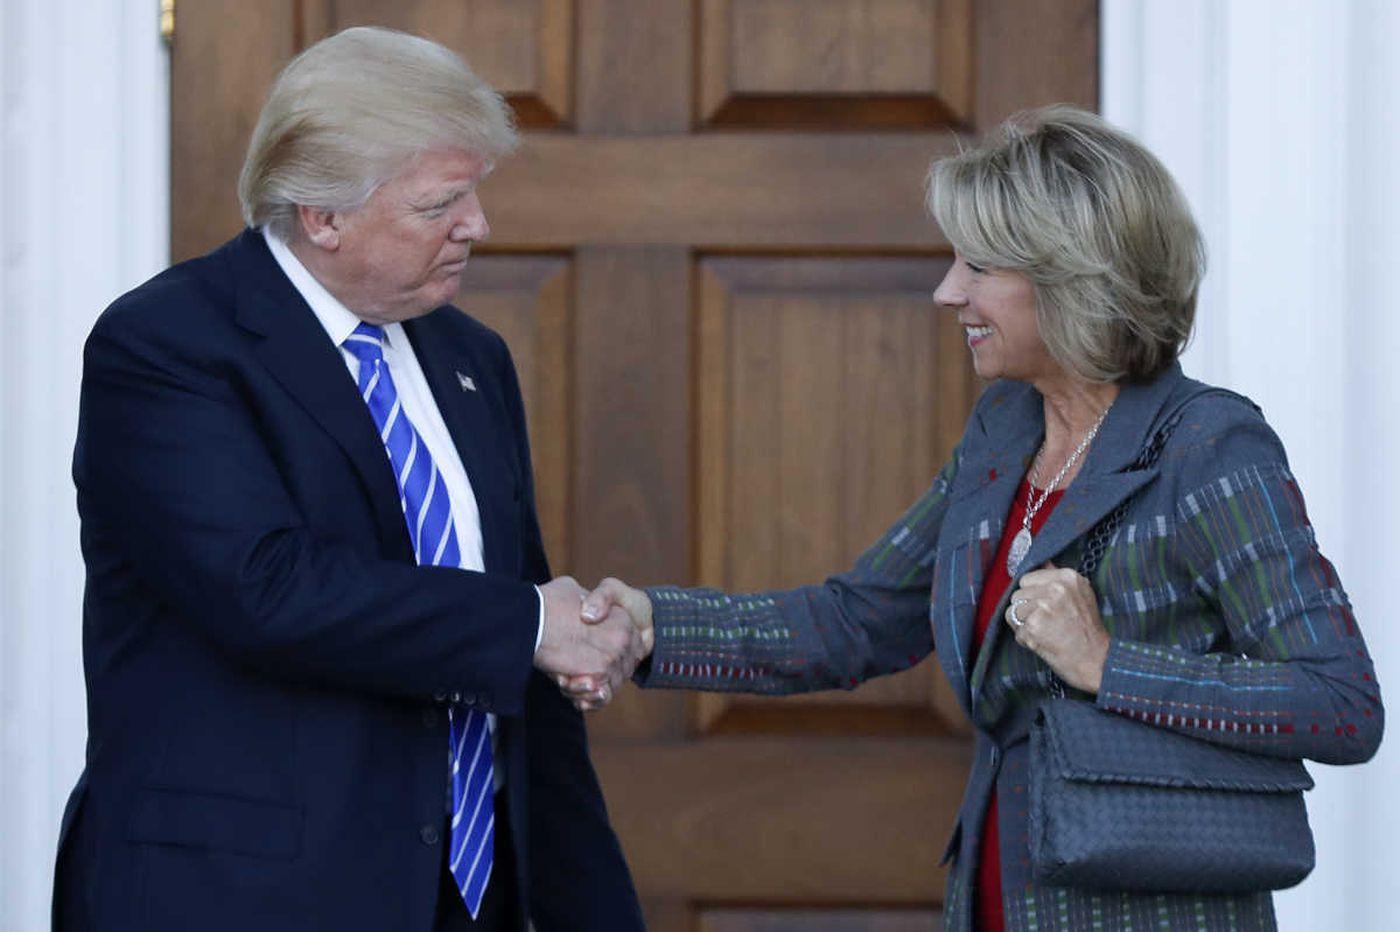 Trump's choice for education secretary sparks debate